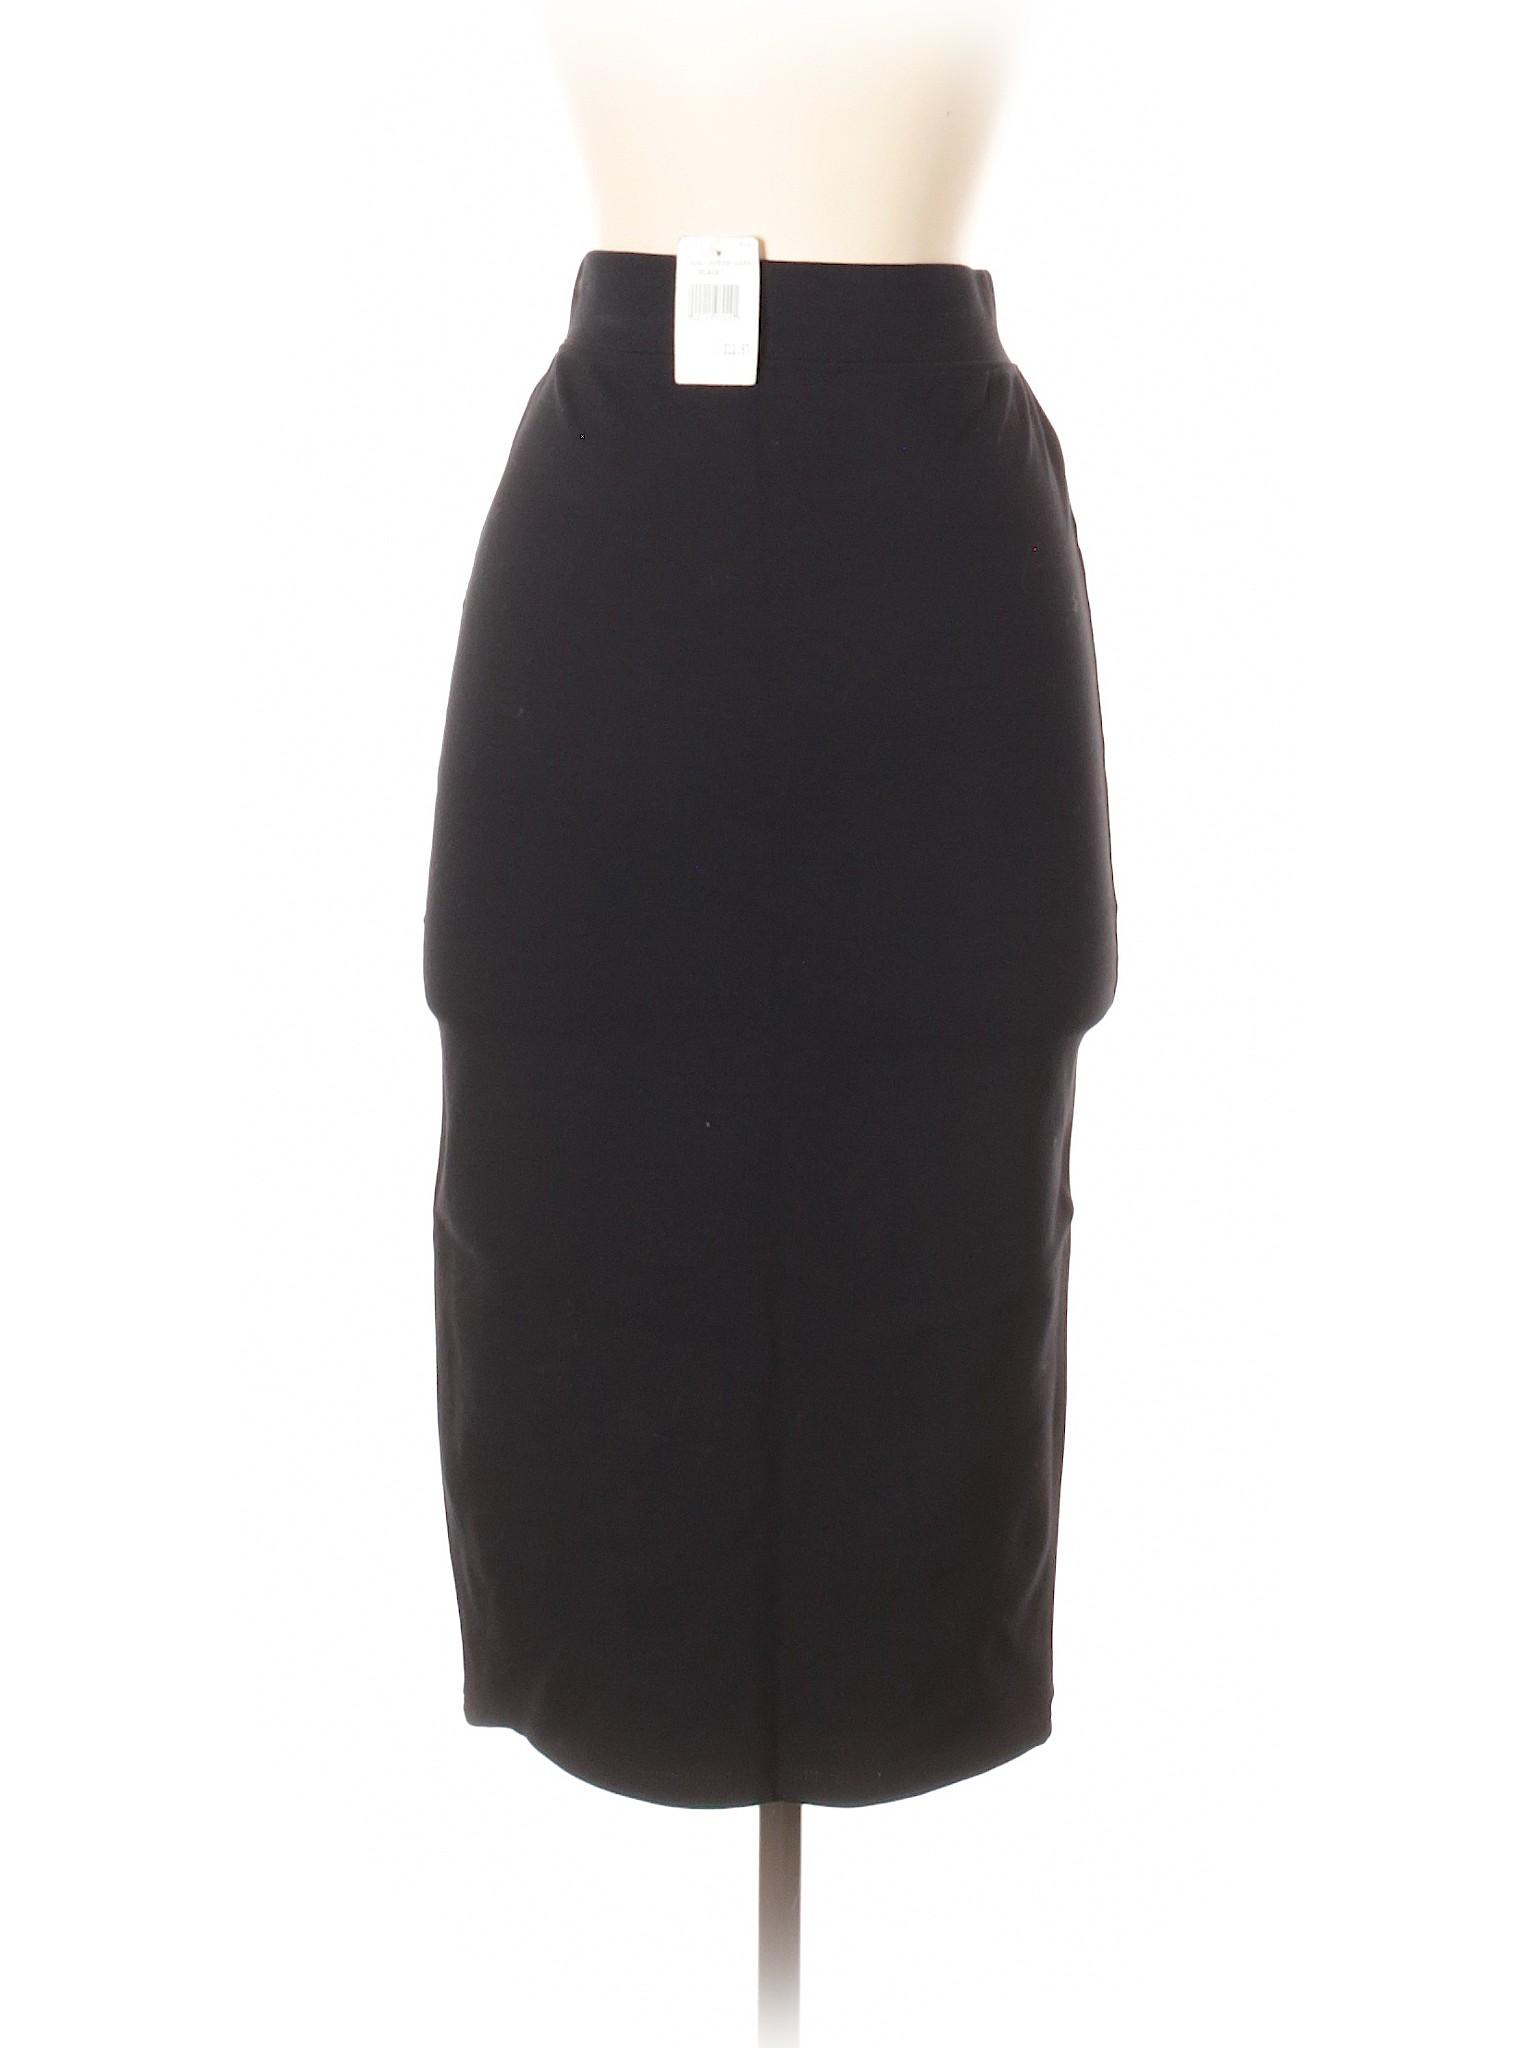 Boutique Skirt leisure leisure Casual iris Boutique zxrYXqz